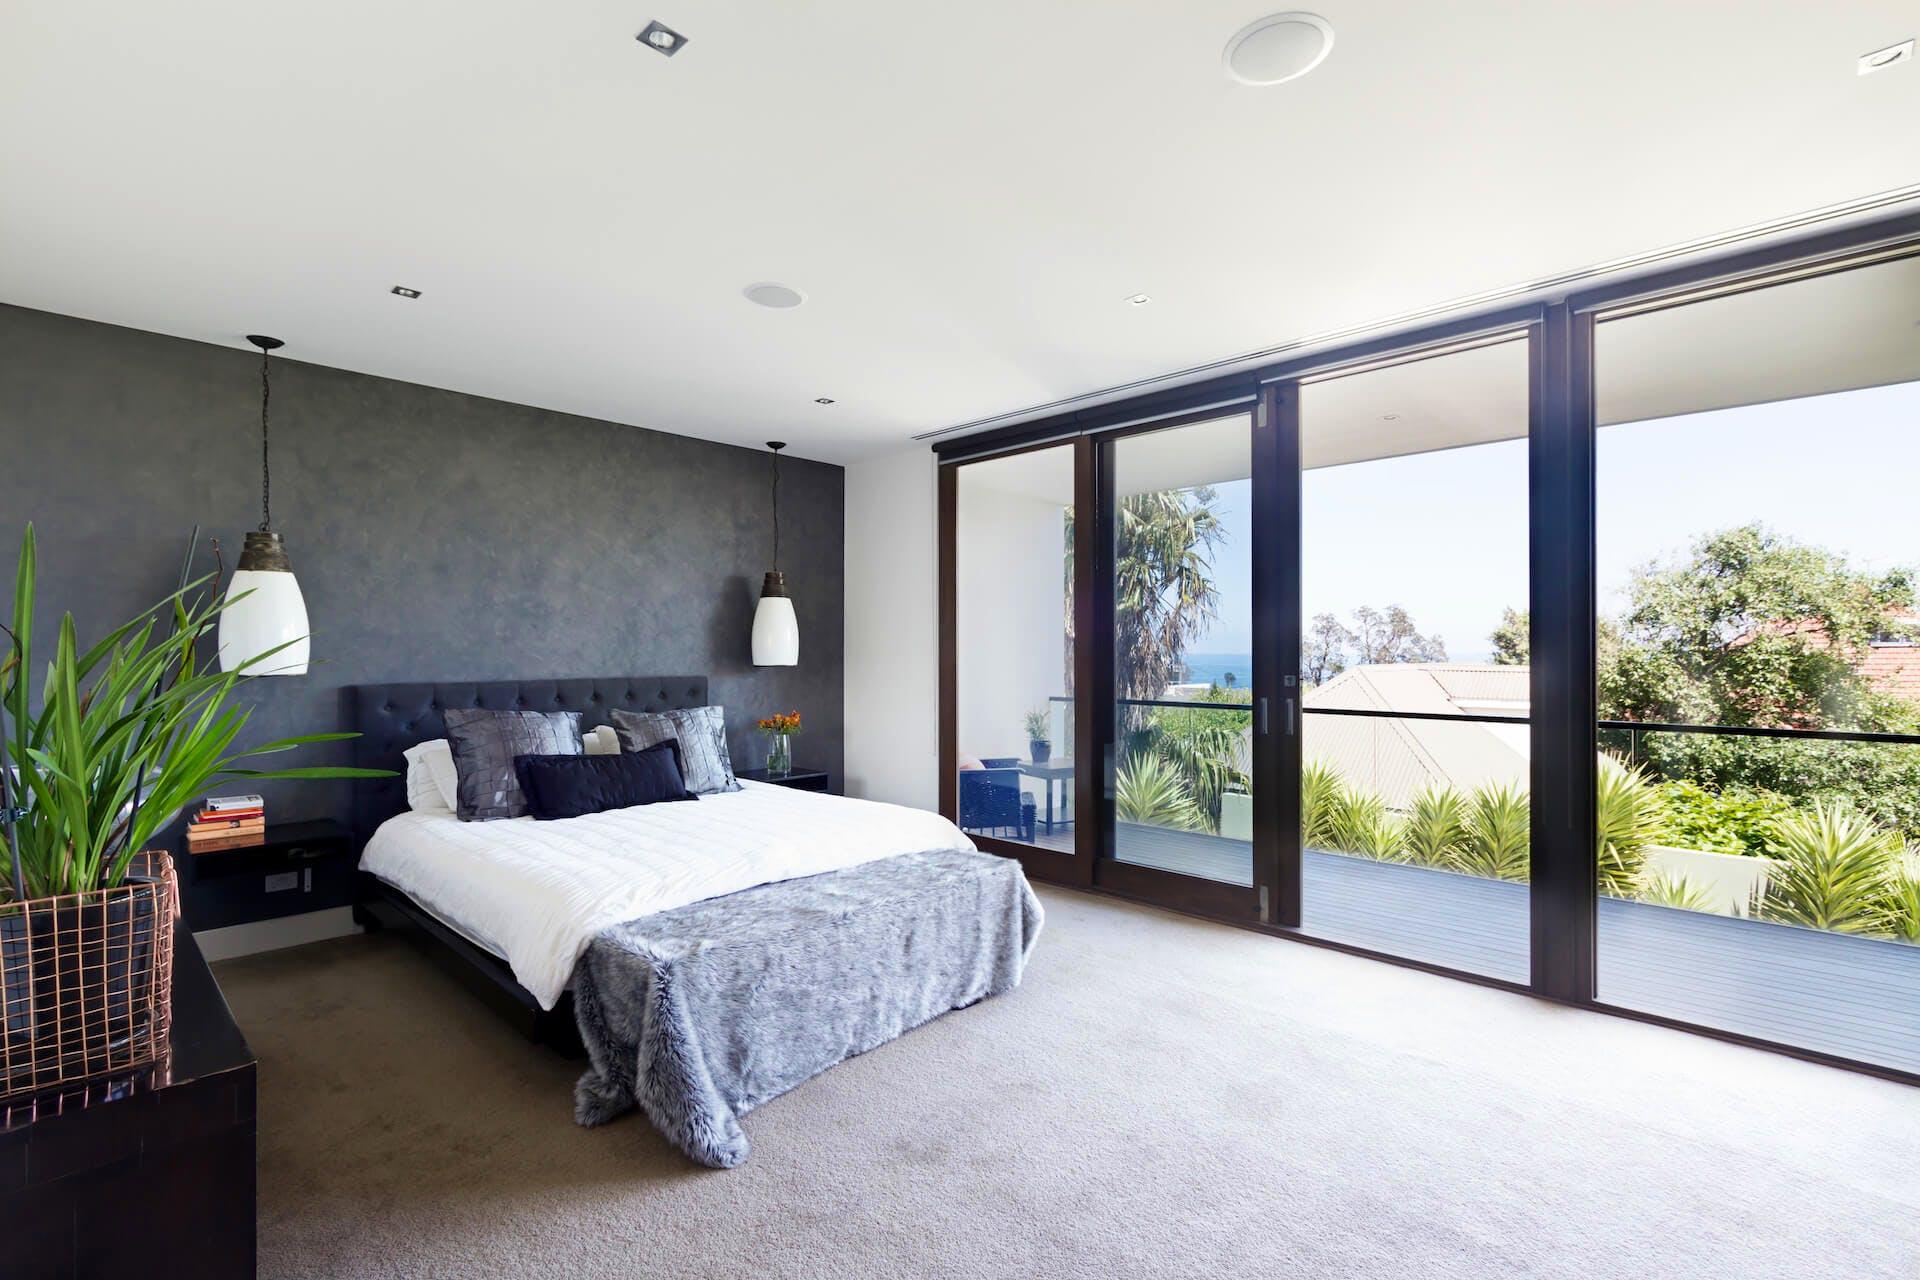 Sliding glass door with black frame in bedroom.